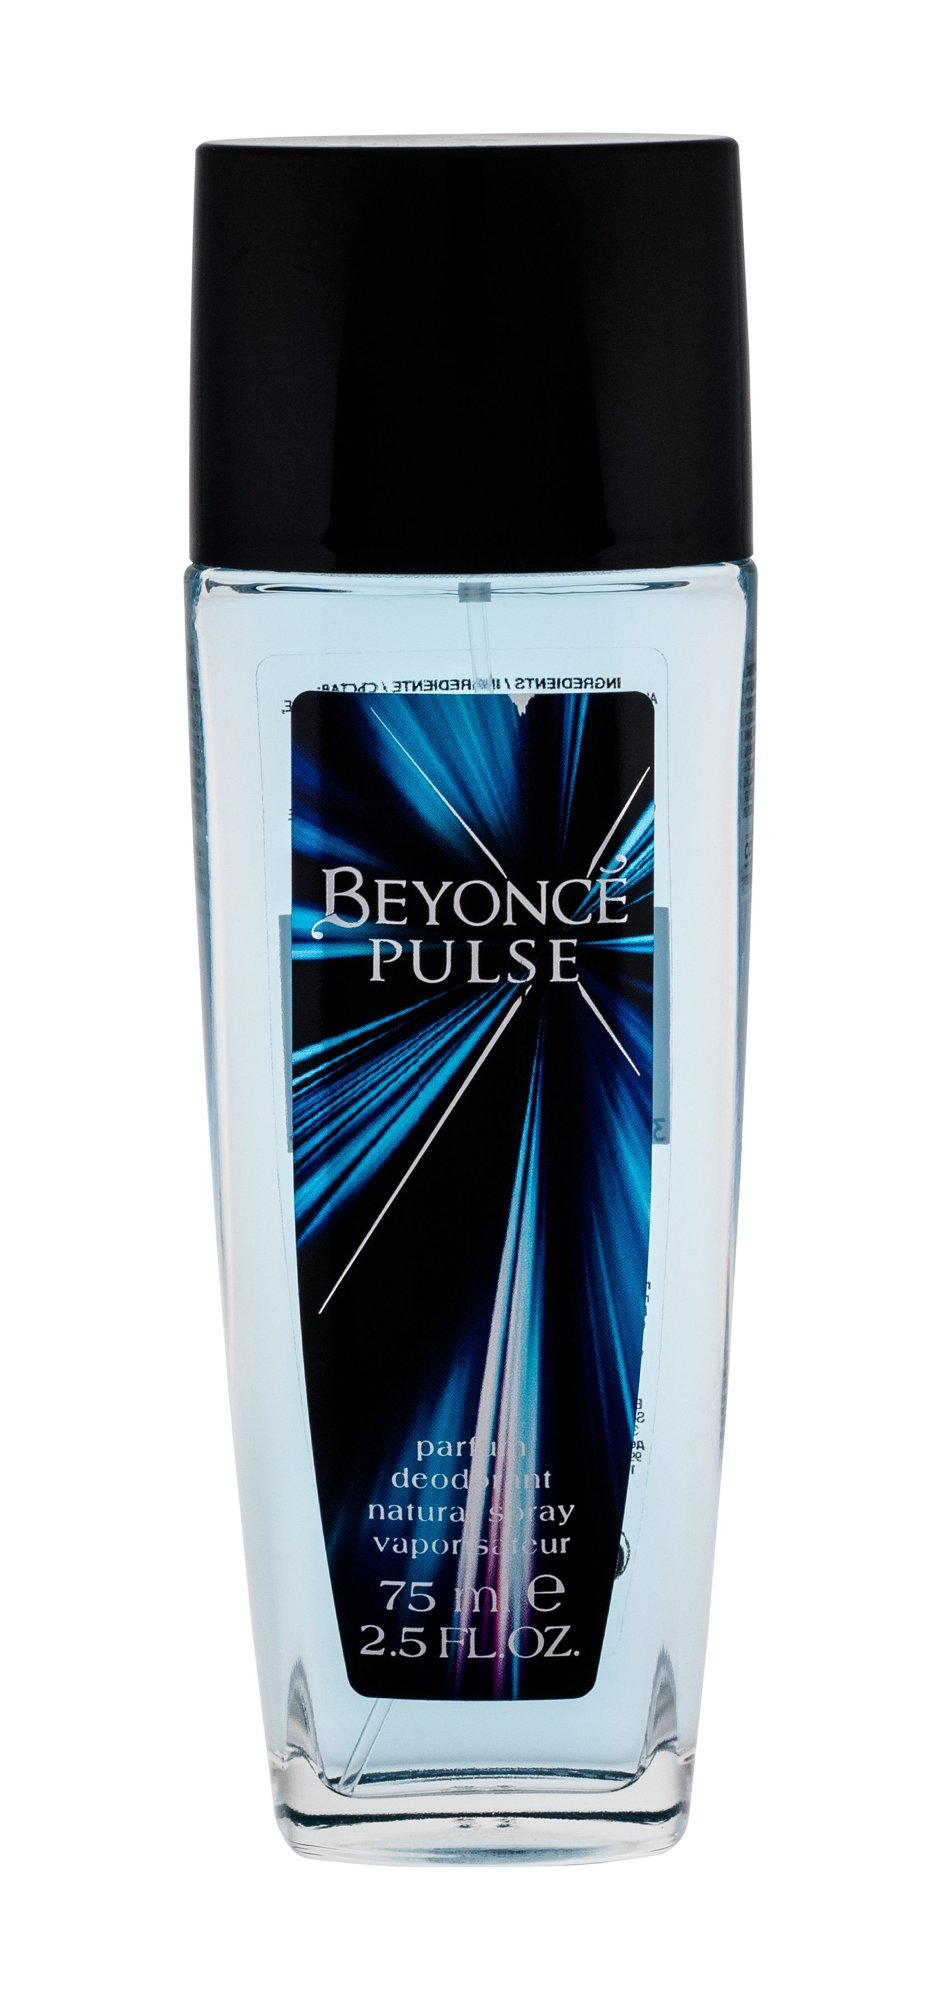 Beyonce Pulse Deodorant 75ml